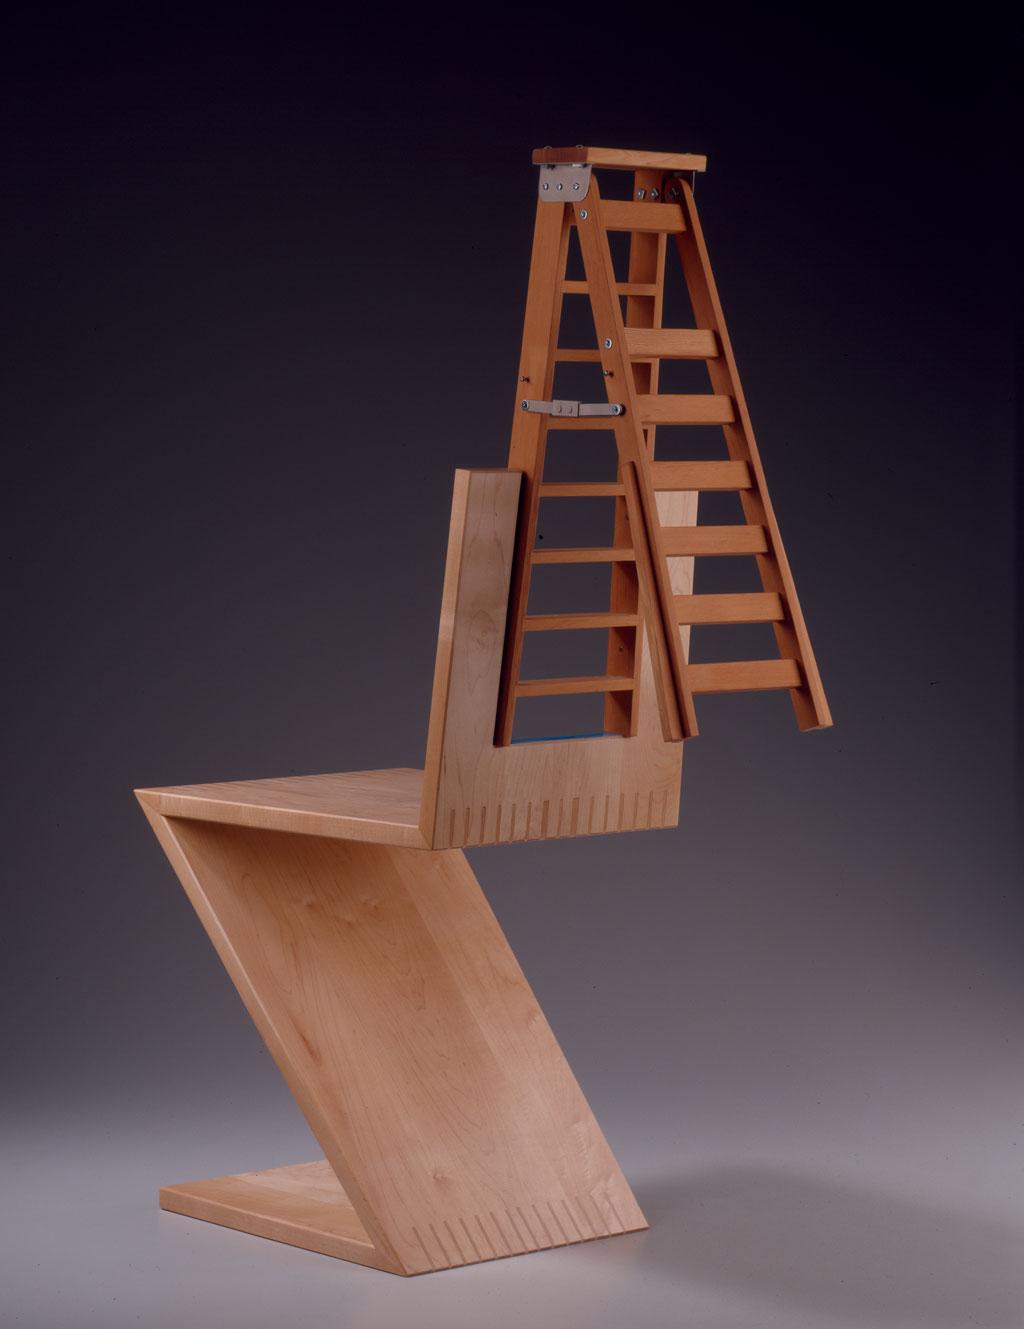 Garry Knox Bennett, Ladderback, 2003. M. Lee Fatheree photograph